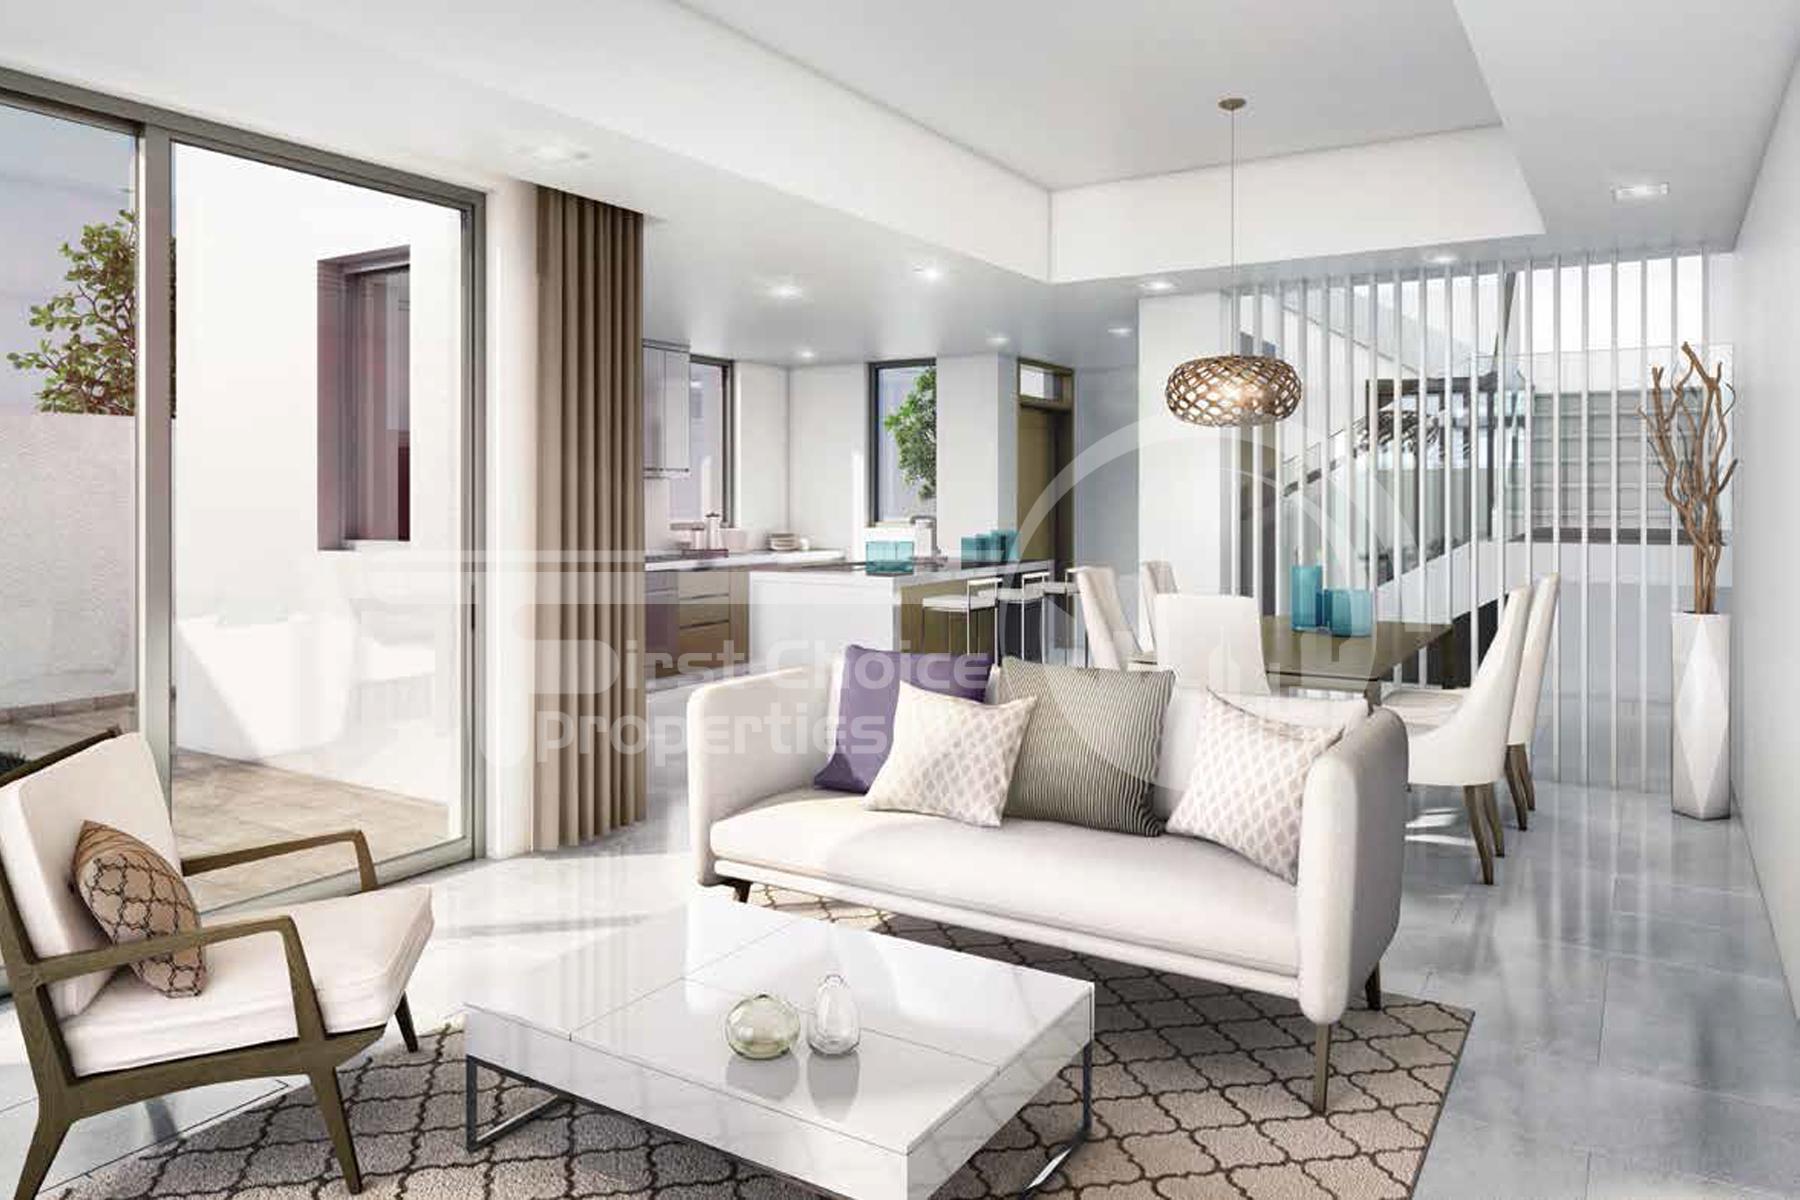 2 Bedroom - 3 Bedroom - 4 Bedroom - 5 Bedroom  Villa - Yas Acres - Yas Island - Abu Dhabi - UAE (22).jpg